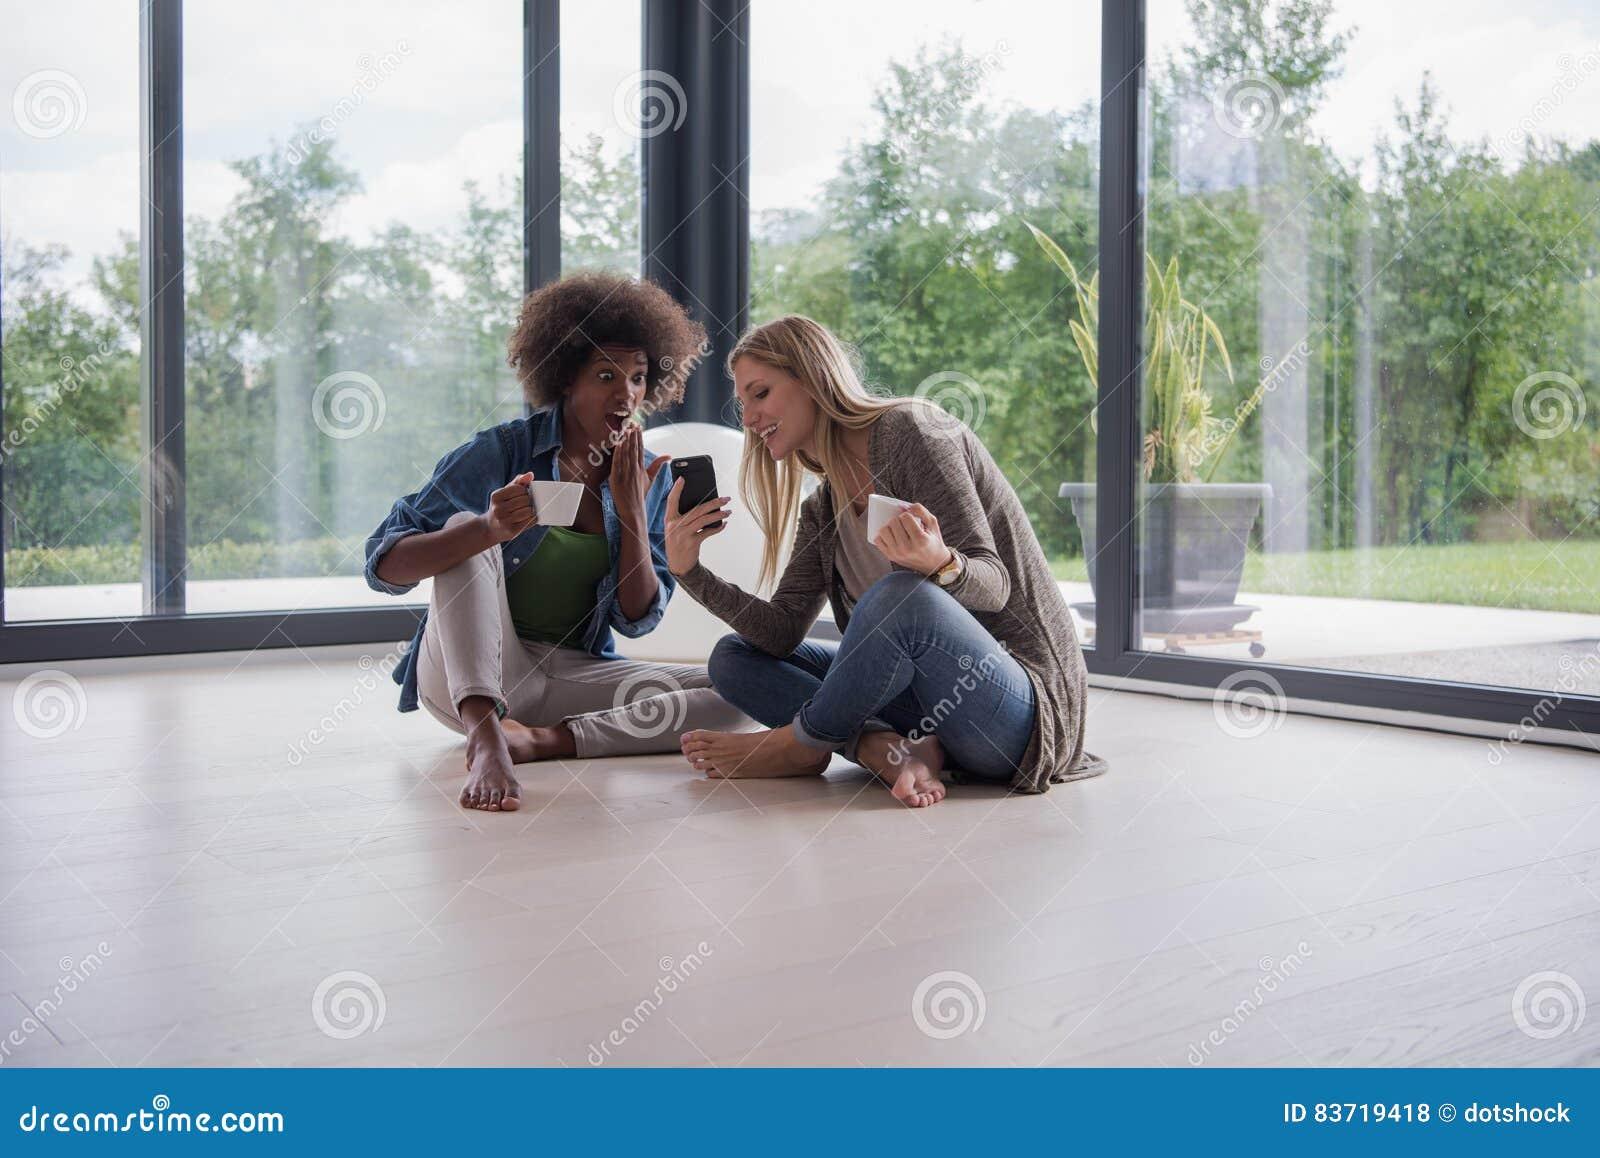 Multiethnic Women Sit On The Floor And Drinking Coffee Stock Photo